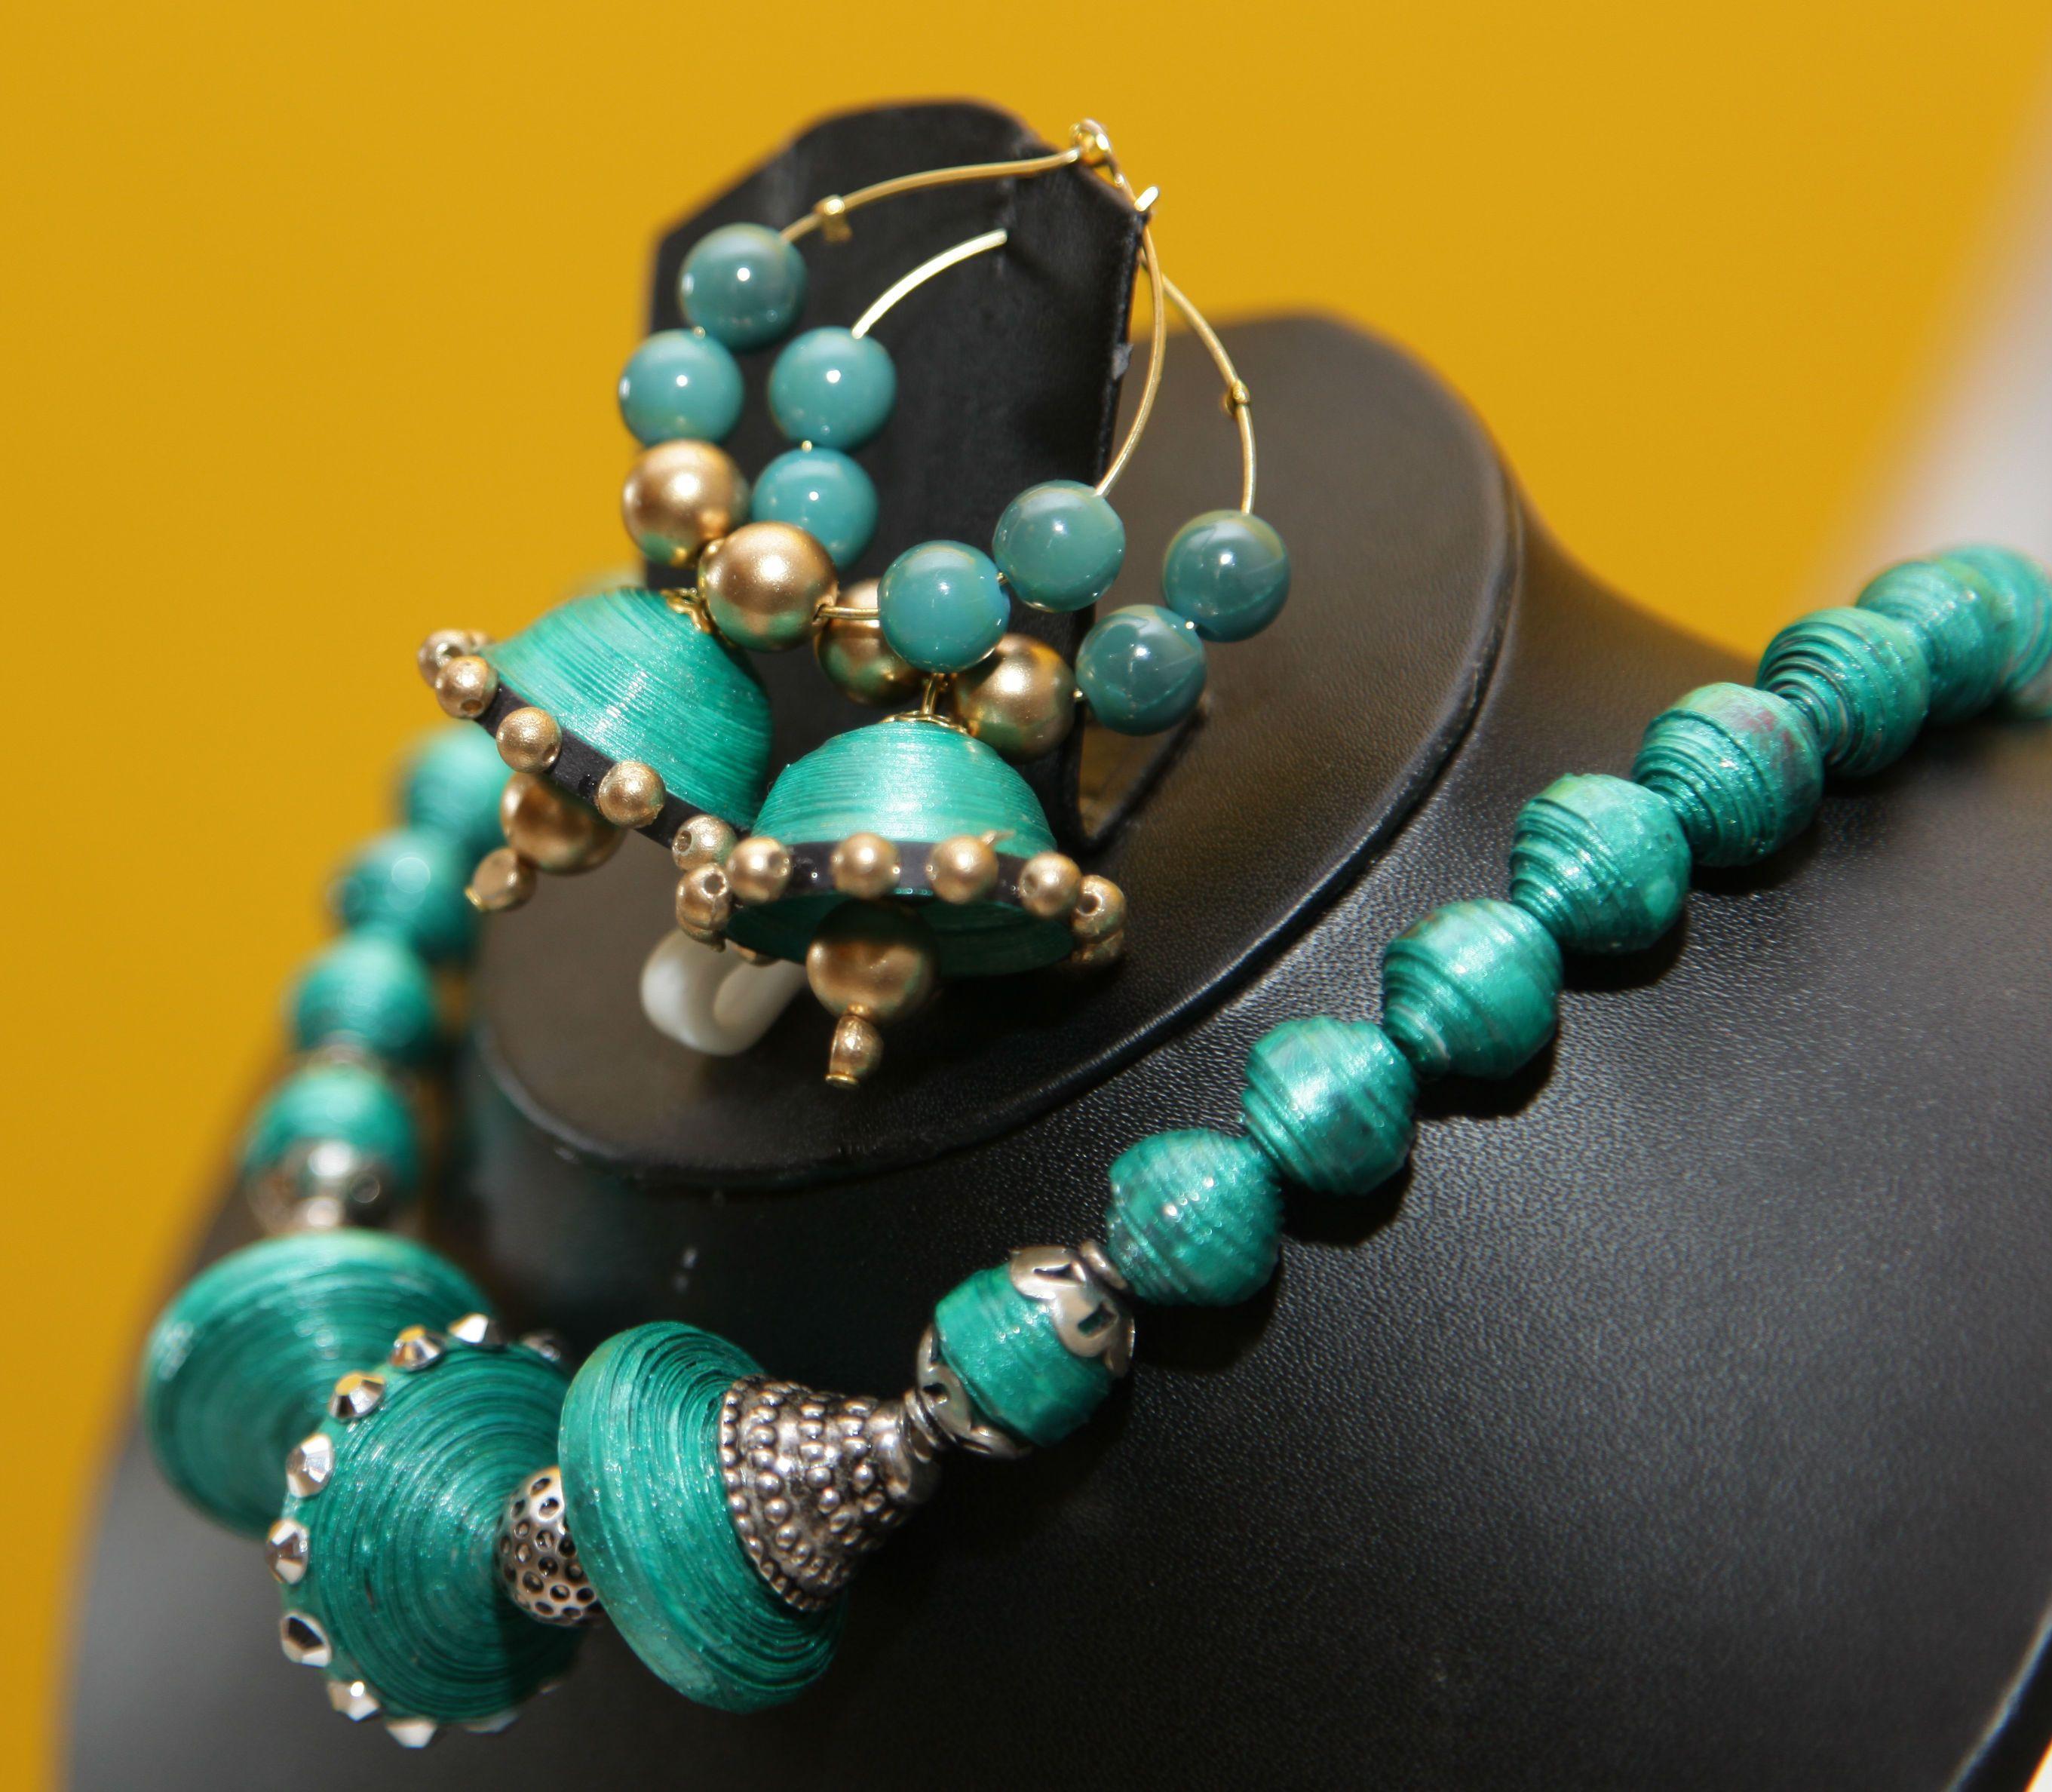 Pushkala - Handmade paper jewelry   Paper jewelry and Beads